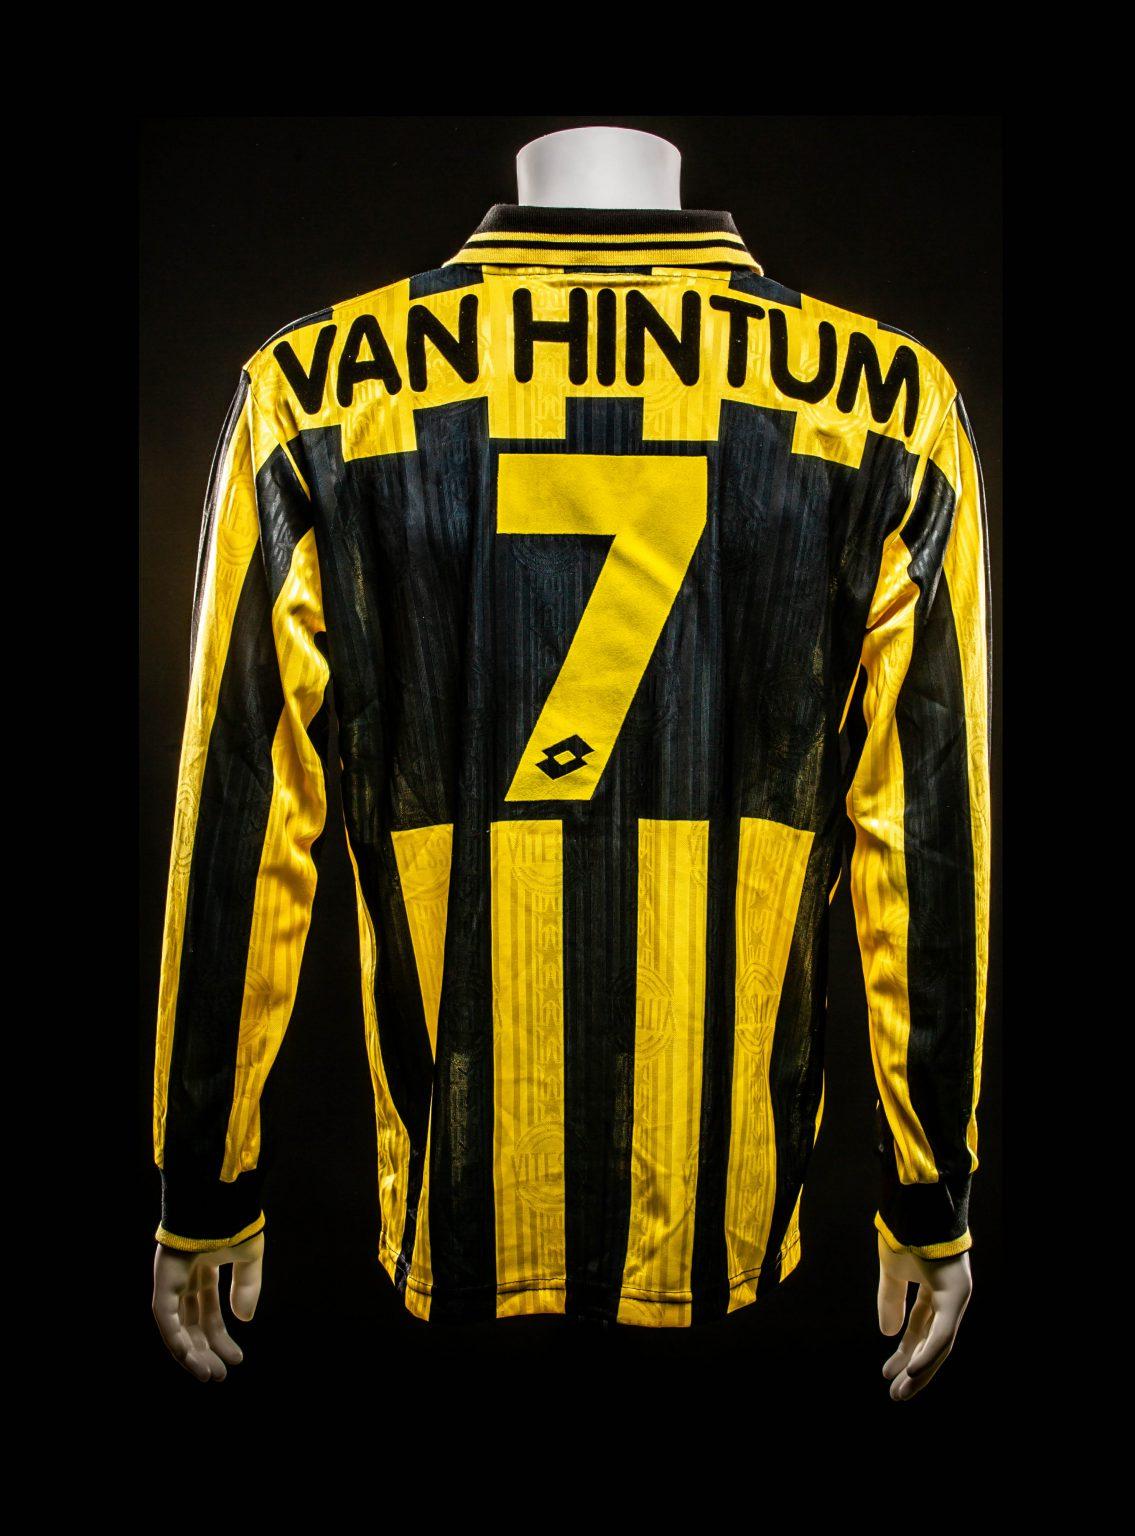 #7 Marc van Hintum